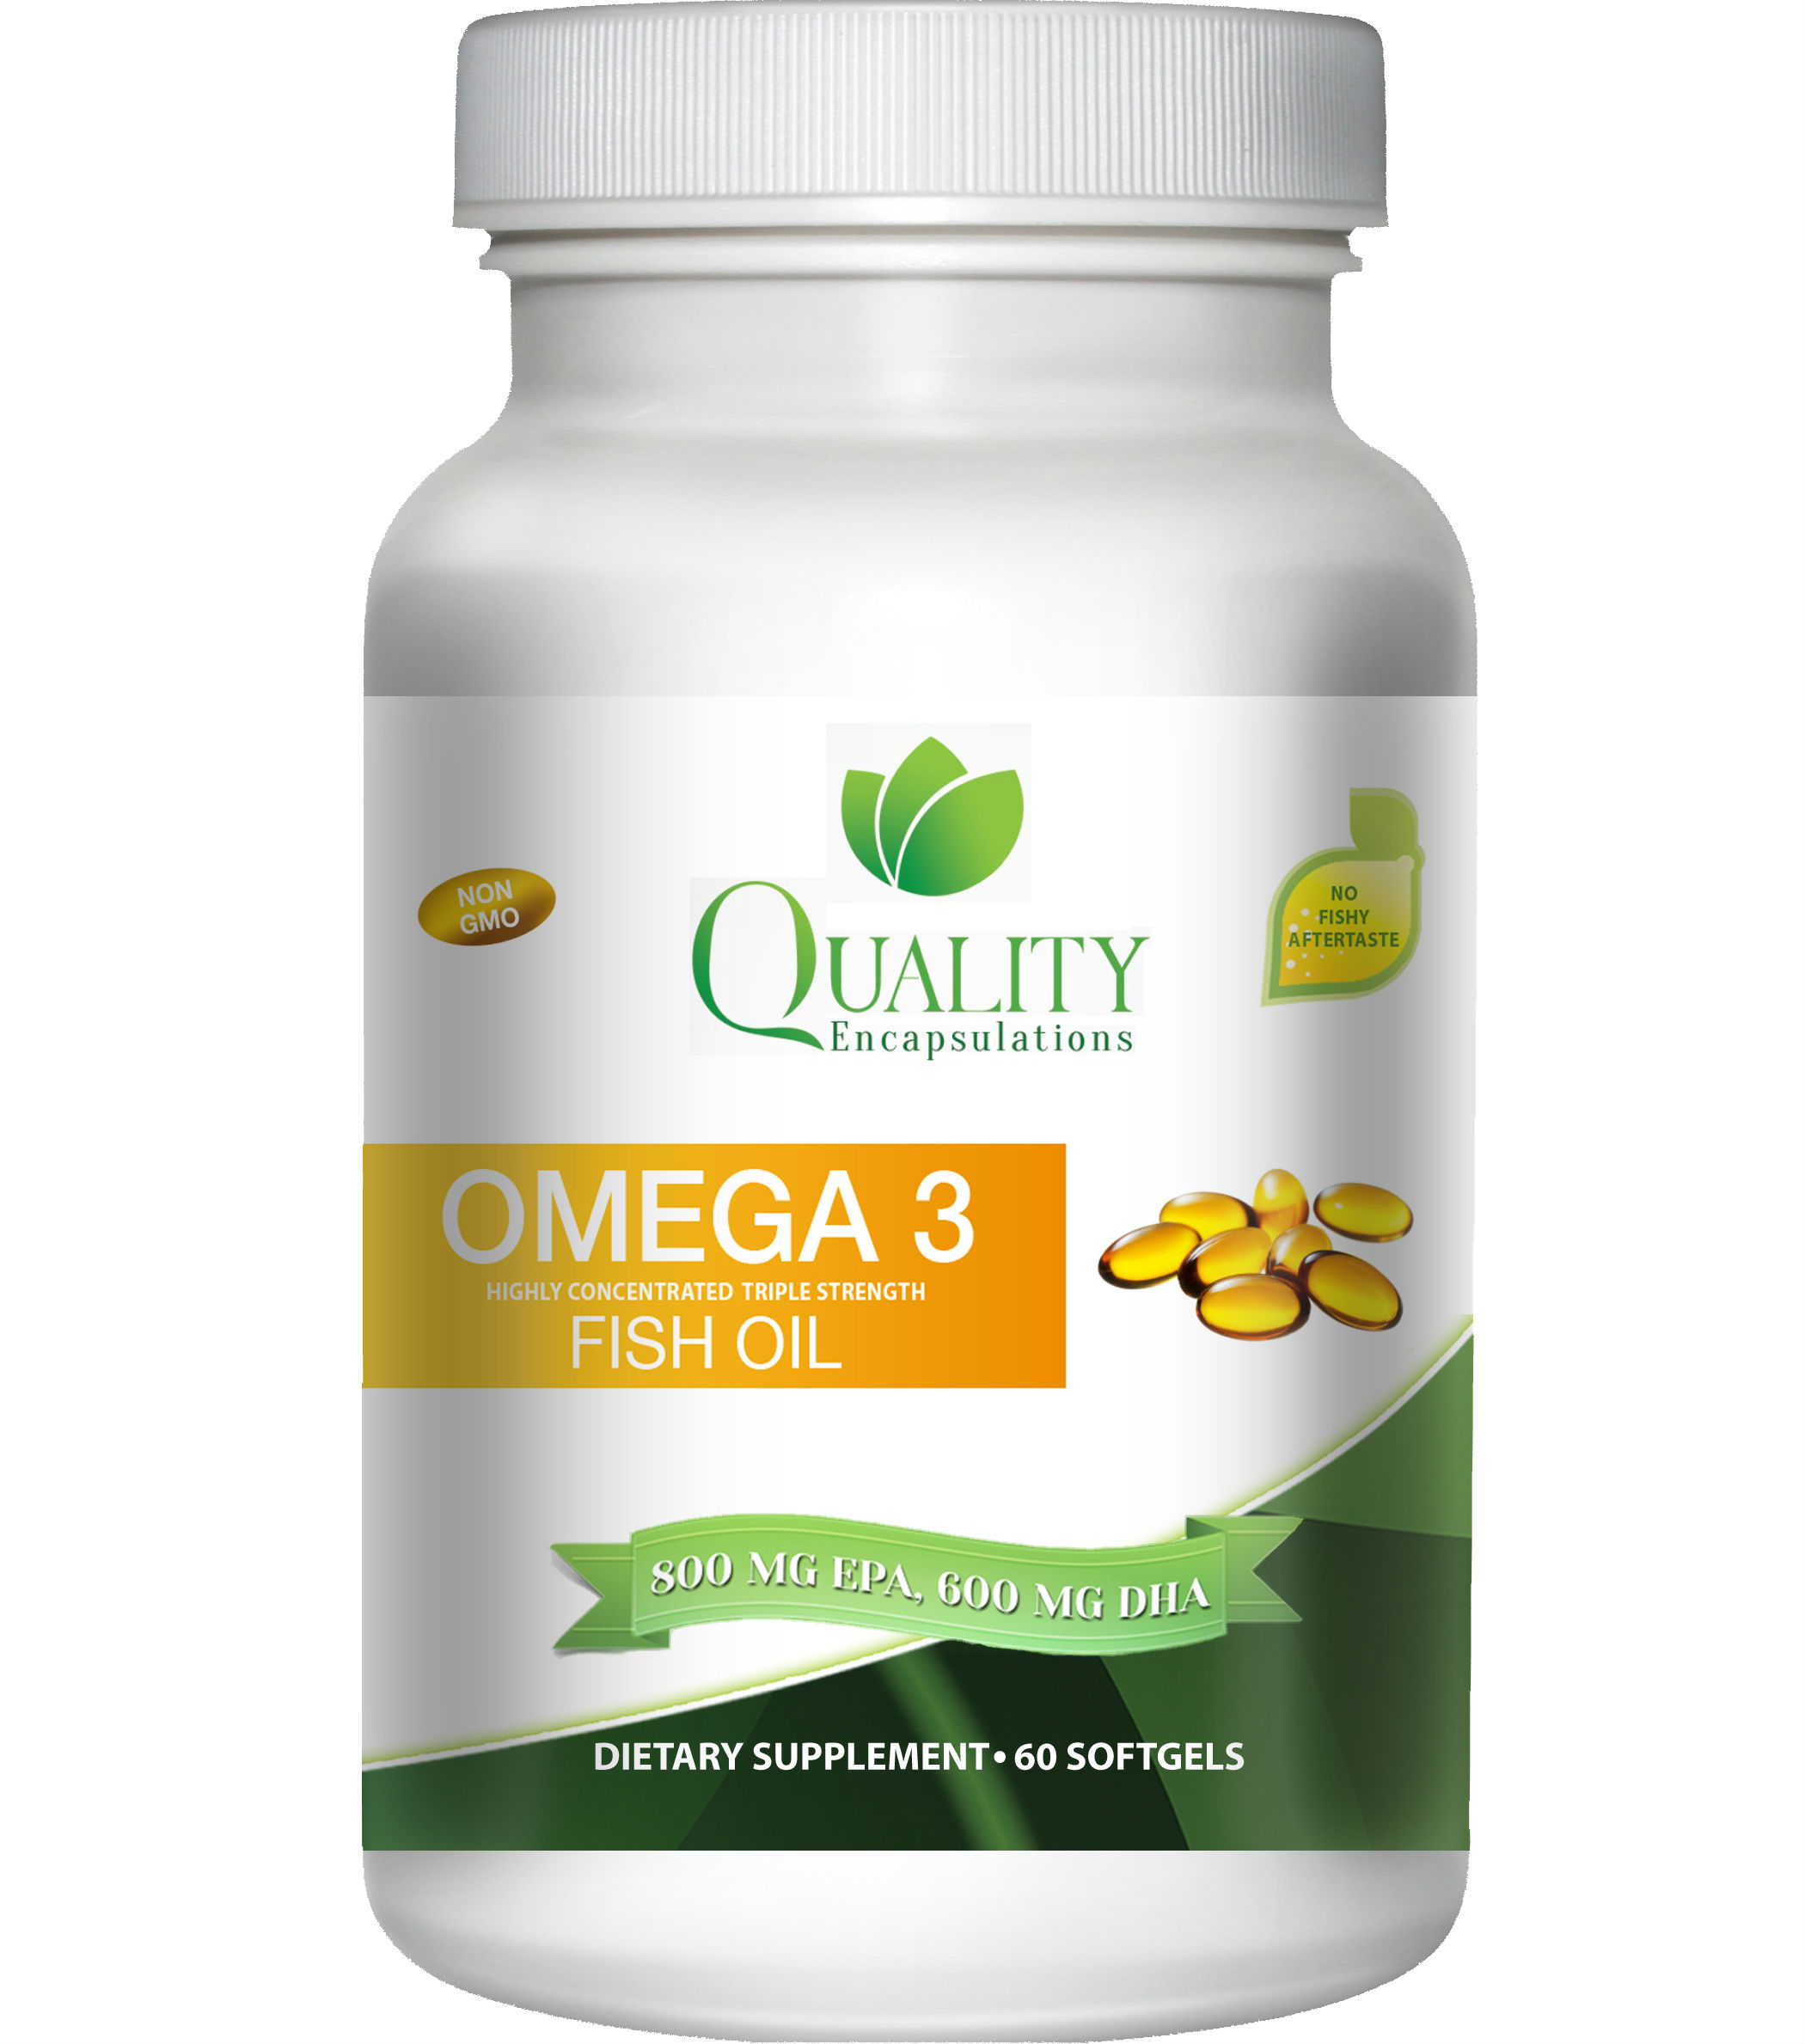 Omega 3 fish oil triple strength for Is omega 3 fish oil